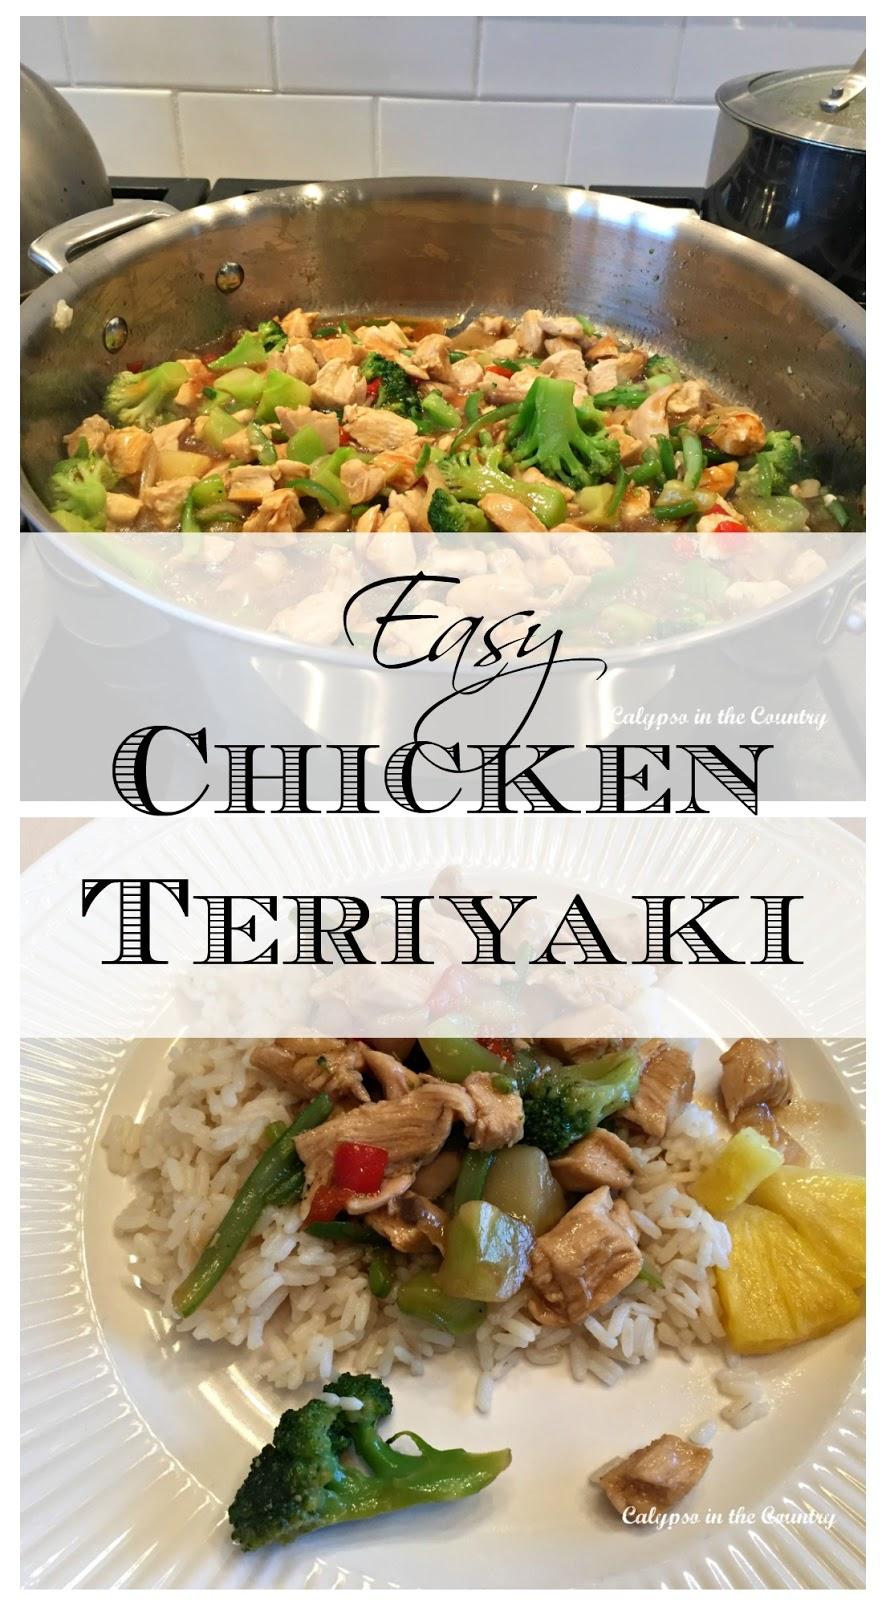 Easy Chicken Teriyaki Stir Fry Recipe - Calypso in the Country Blog